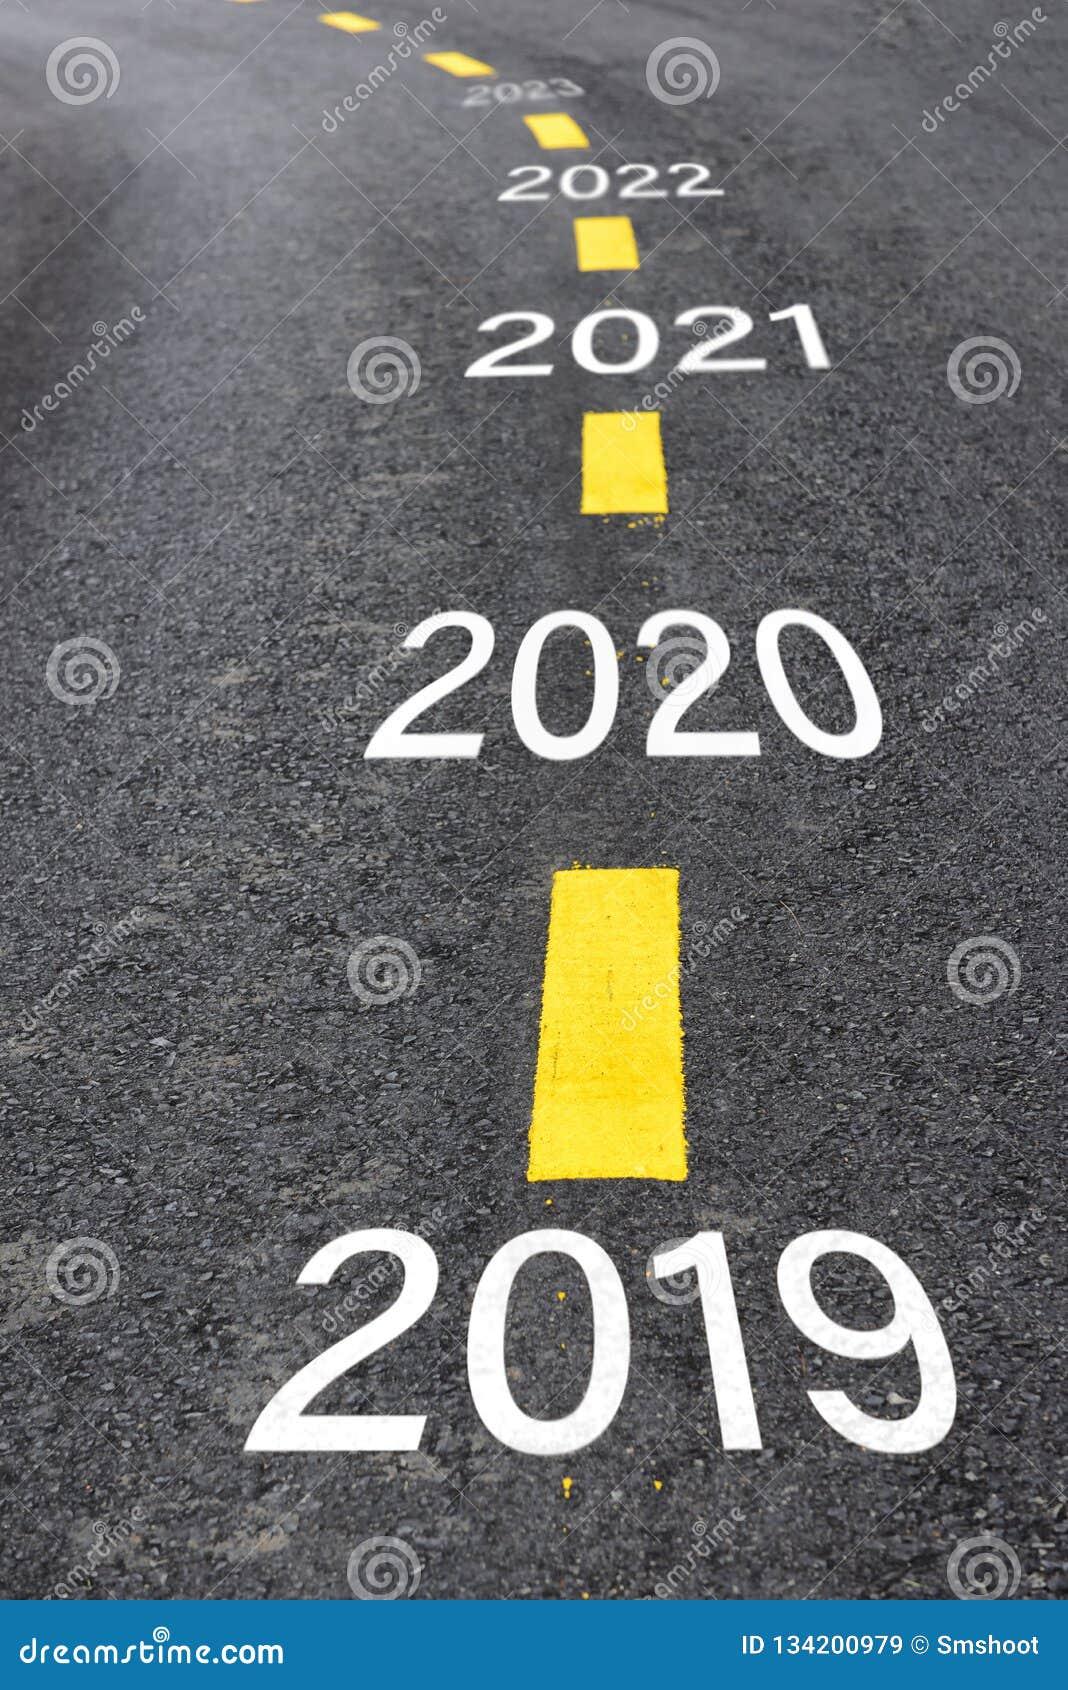 Newsroom   The Road Ahead in 2020  2020 The Road Ahead